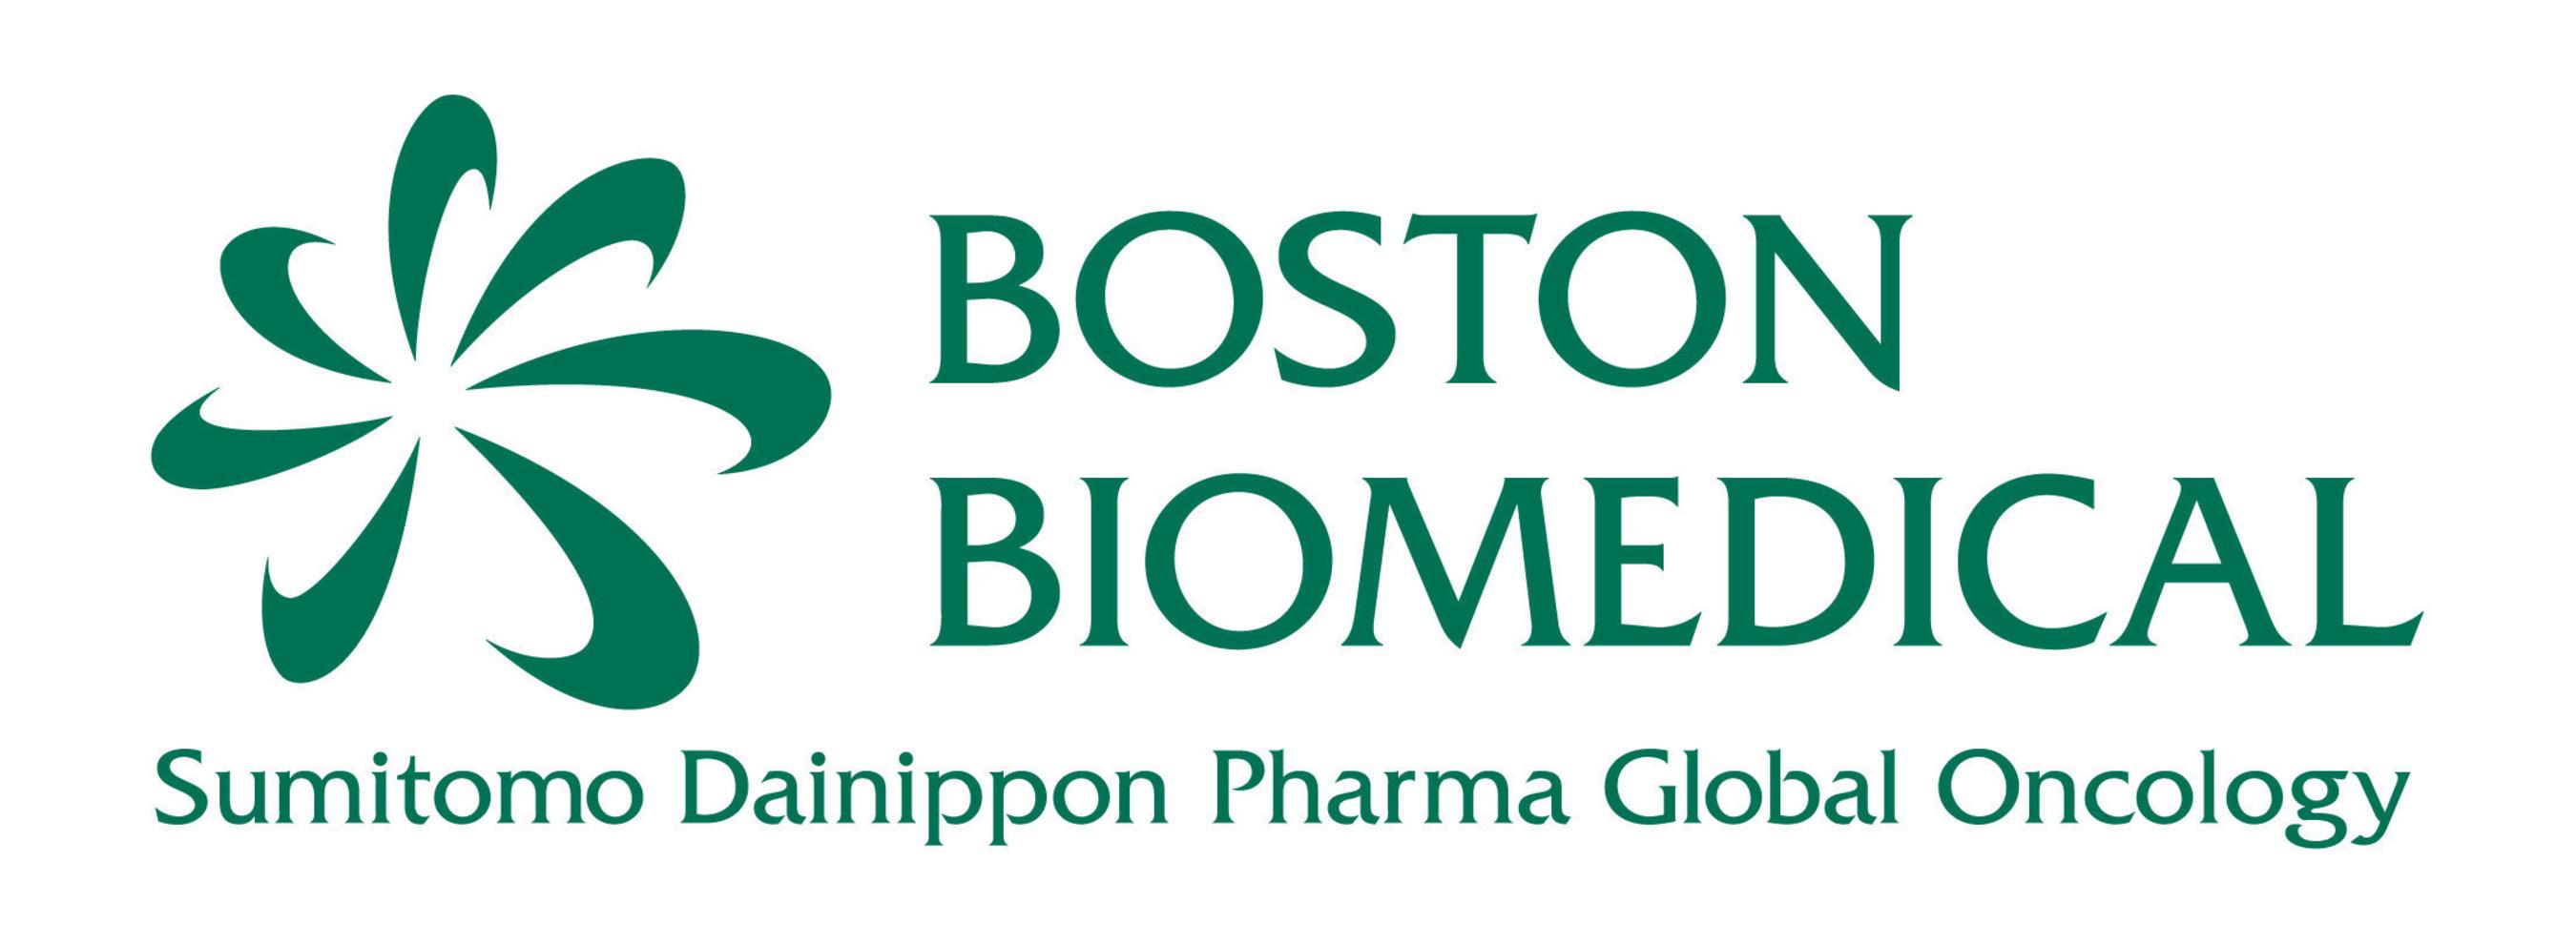 Boston Biomedical, Inc. (PRNewsFoto/Boston Biomedical Pharma, Inc.)